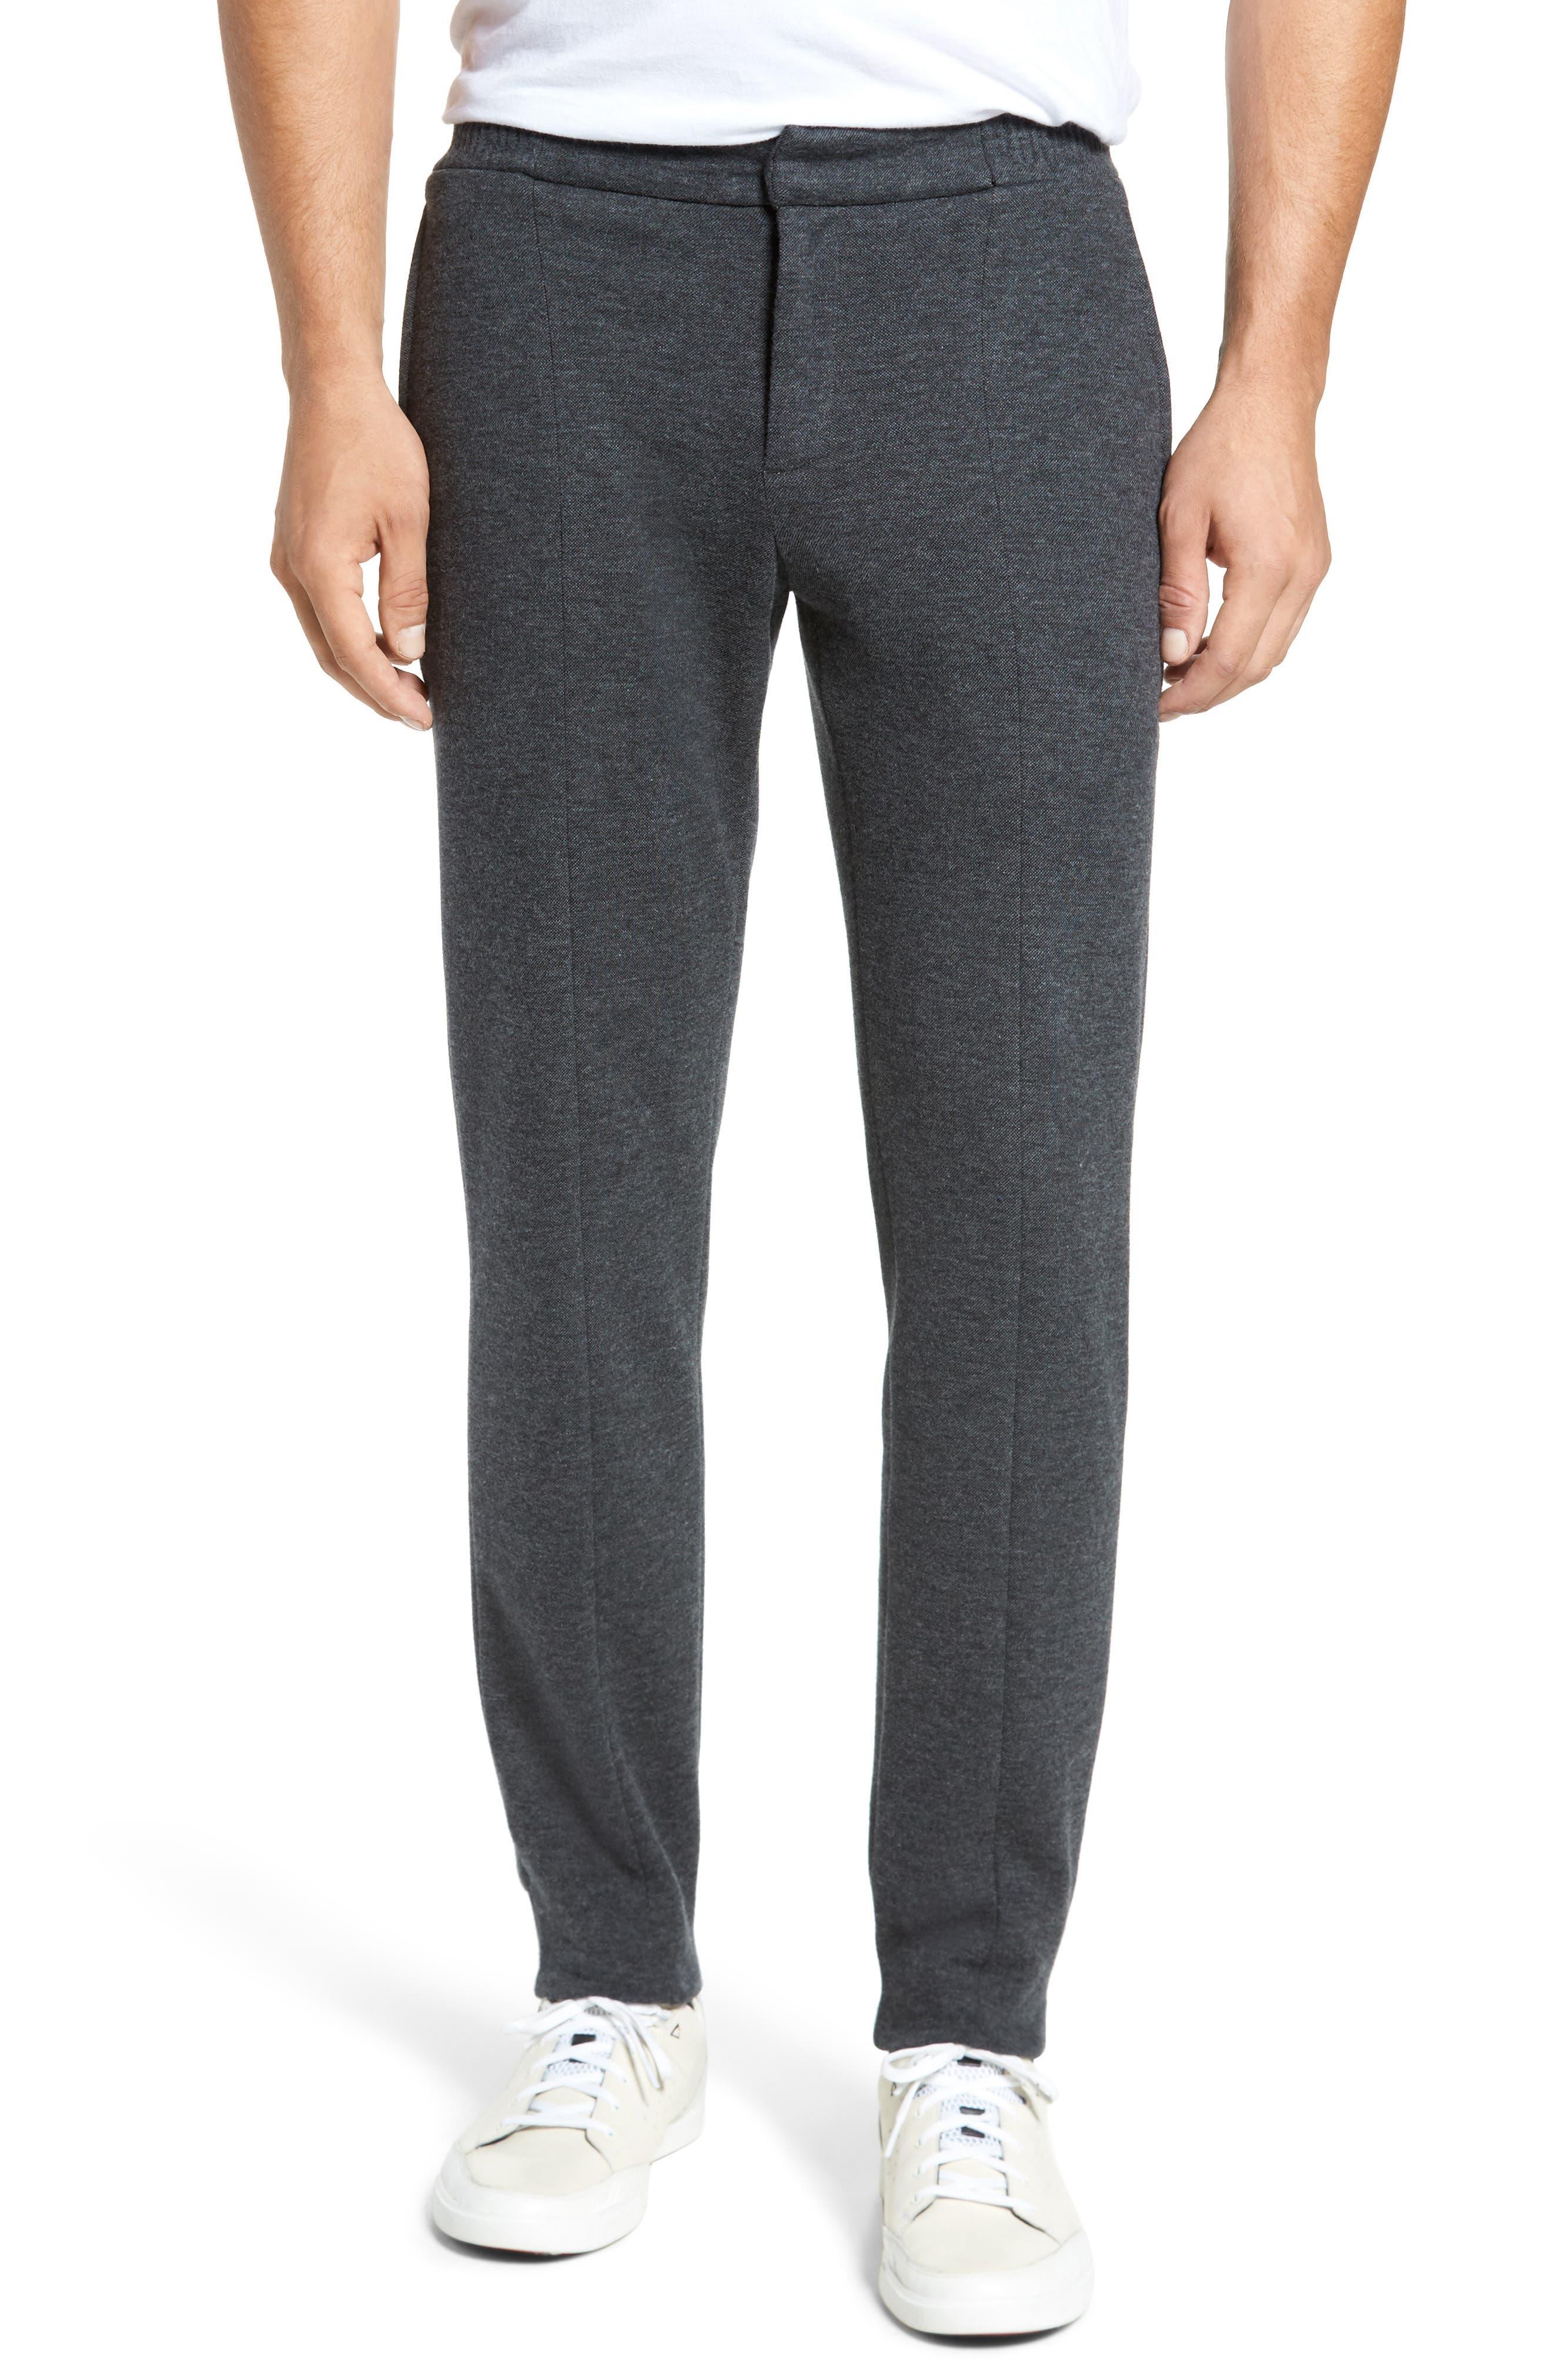 Jordan Flat Front Cotton Jogger Trousers,                         Main,                         color, Medium Grey